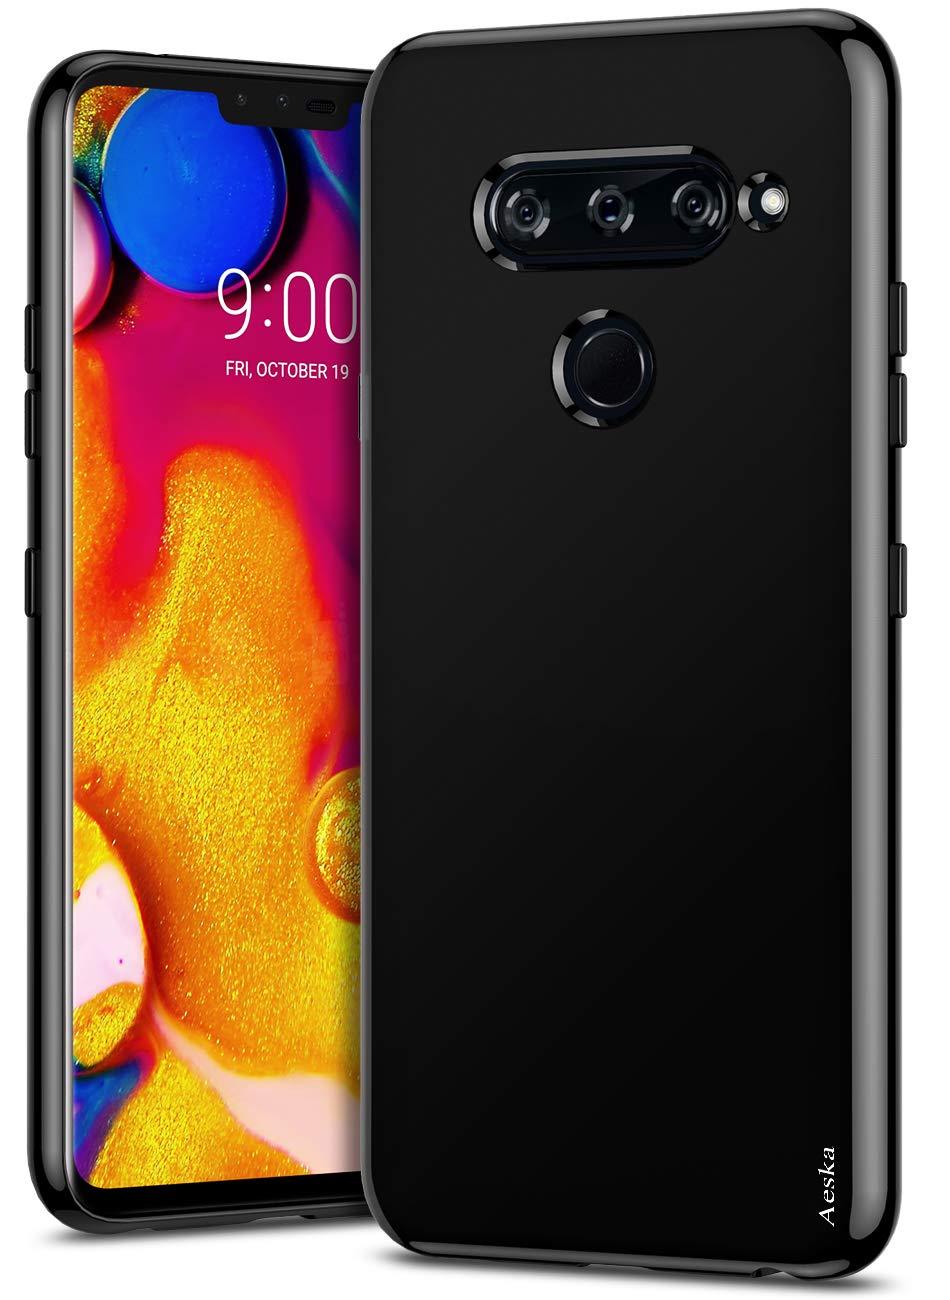 Aeska LG V40 ThinQ Case, LG V40 Case, Ultra [Slim Thin] Flexible TPU Gel Rubber Soft Skin Silicone Protective Case Cover for LG V40 ThinQ/LG V40 (Black)